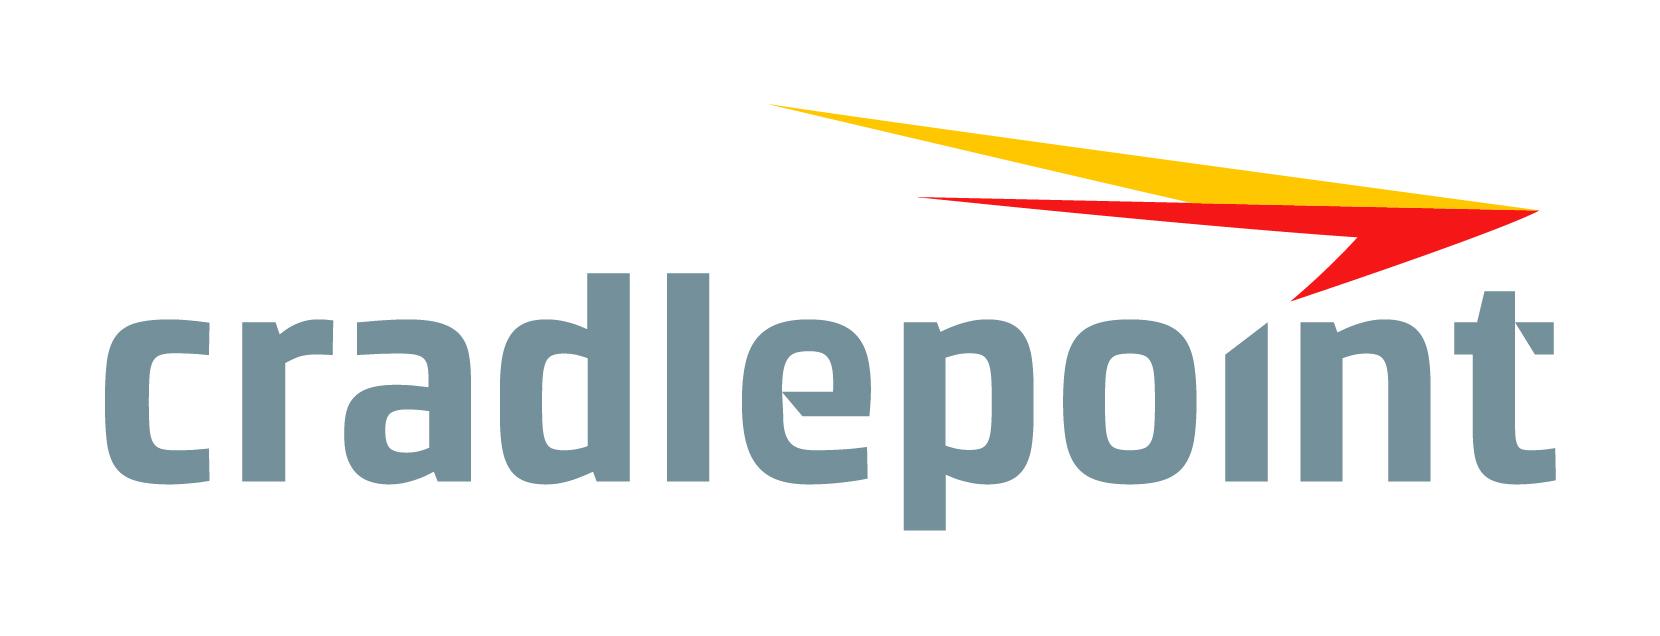 cp-logo-full-color